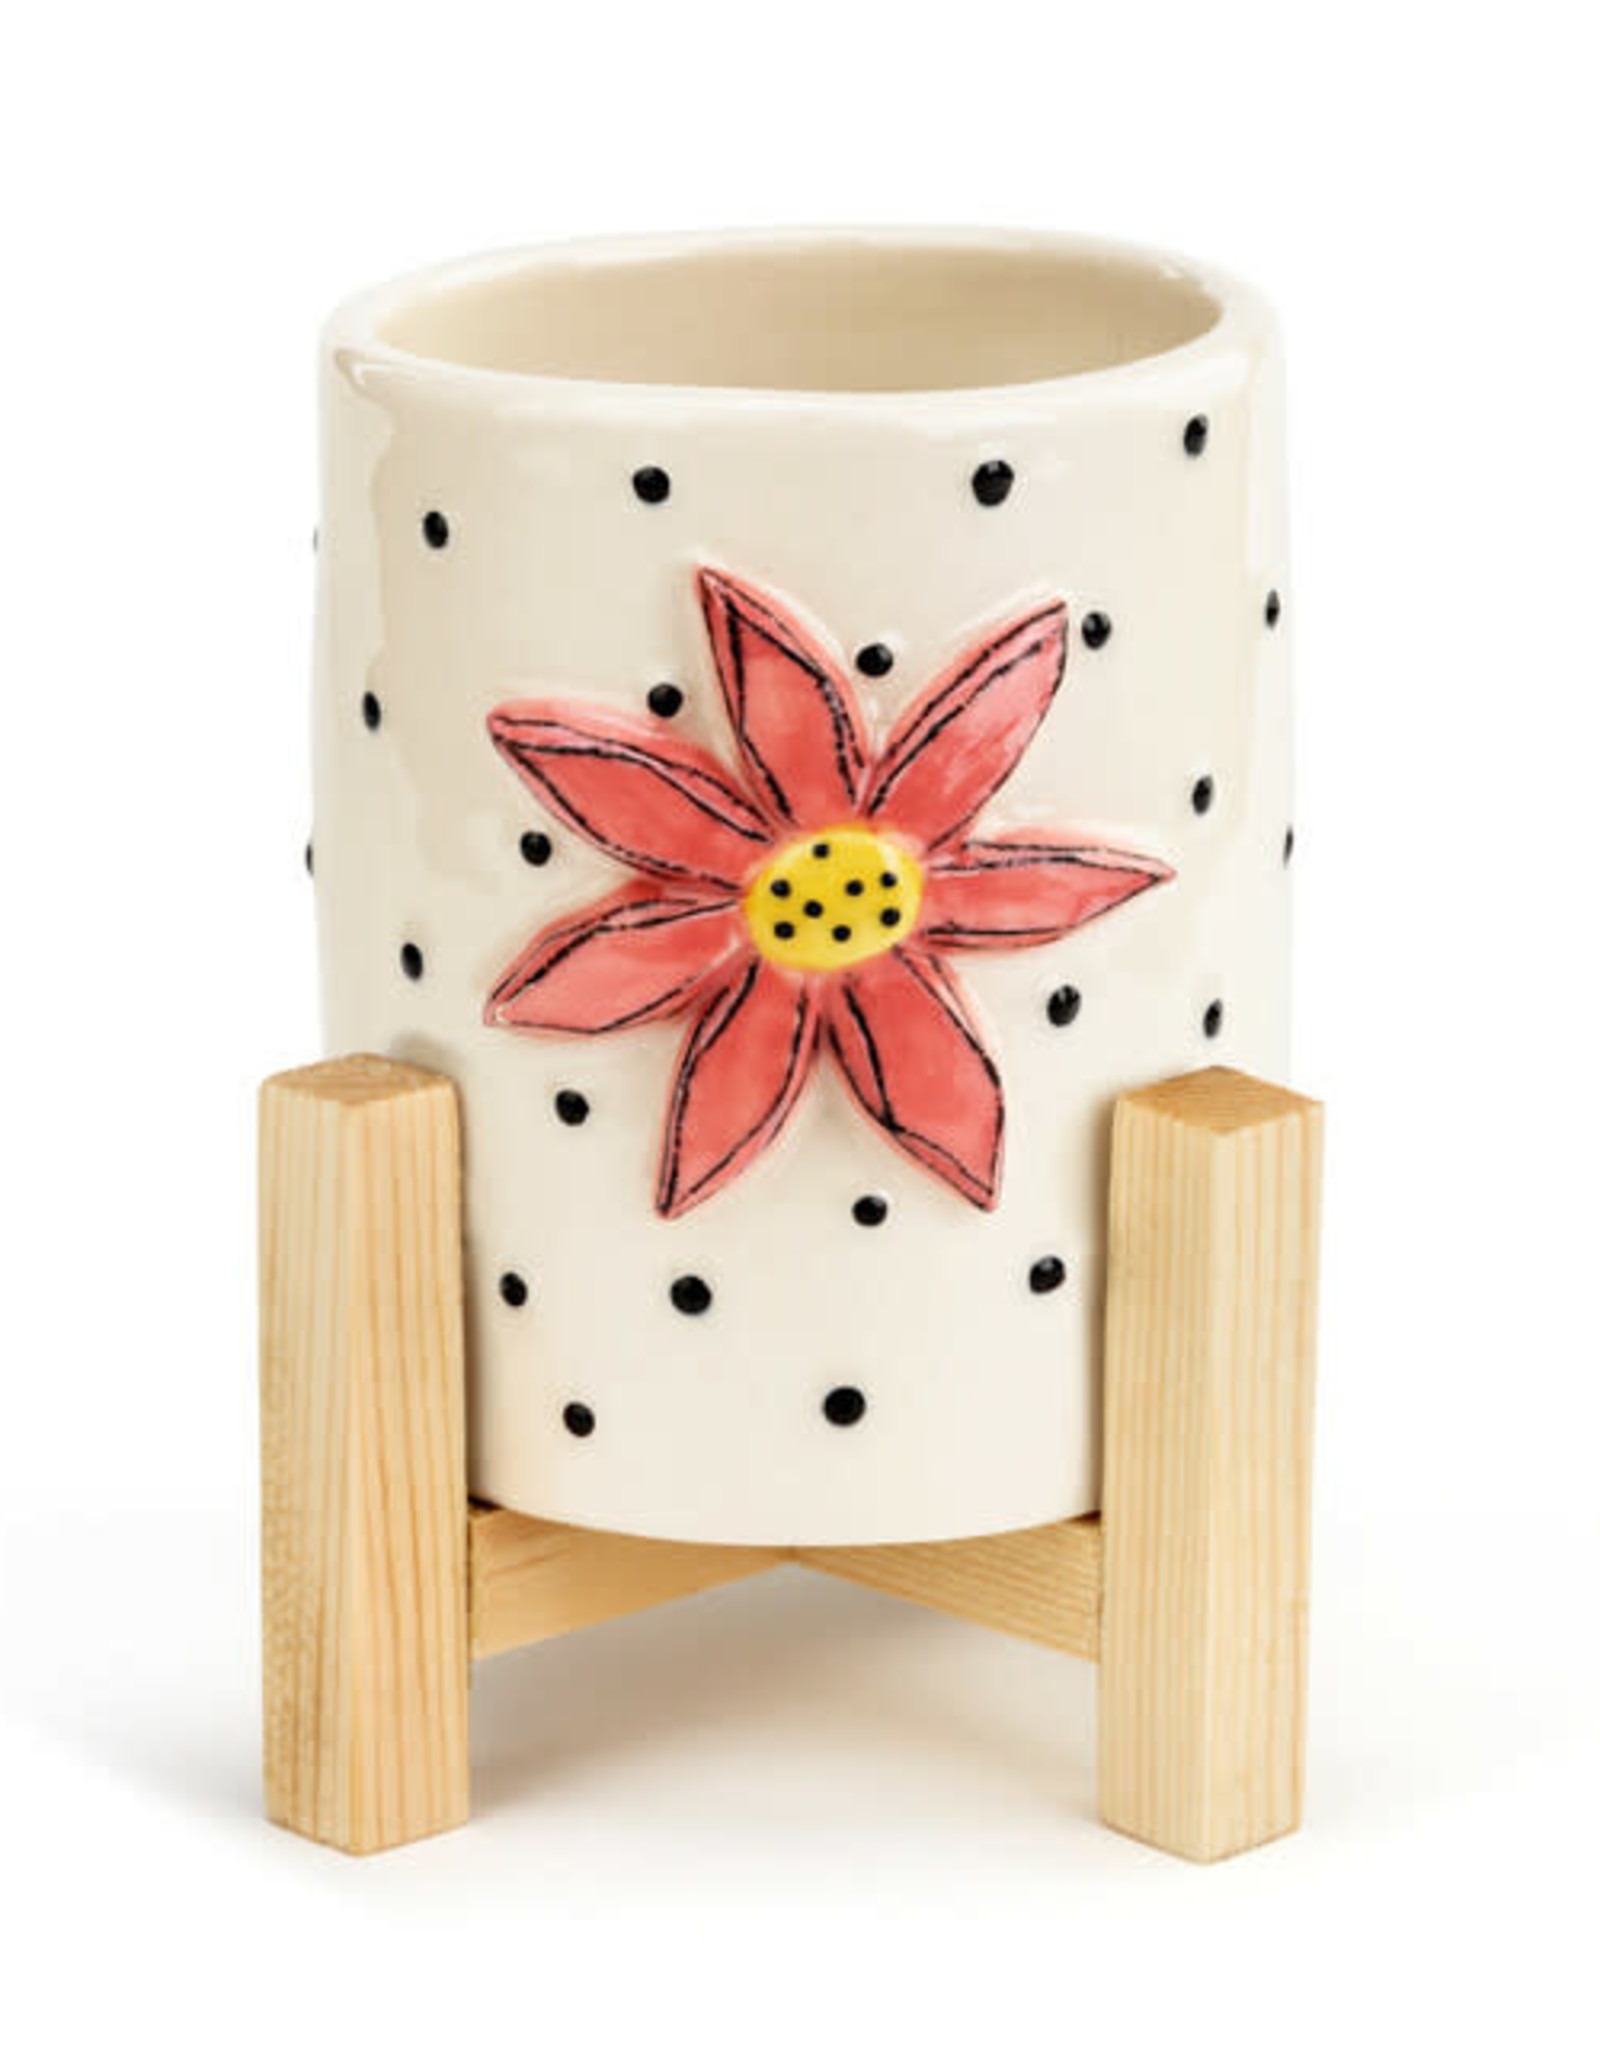 Demdaco Heartful Home   Mini Planter- flower